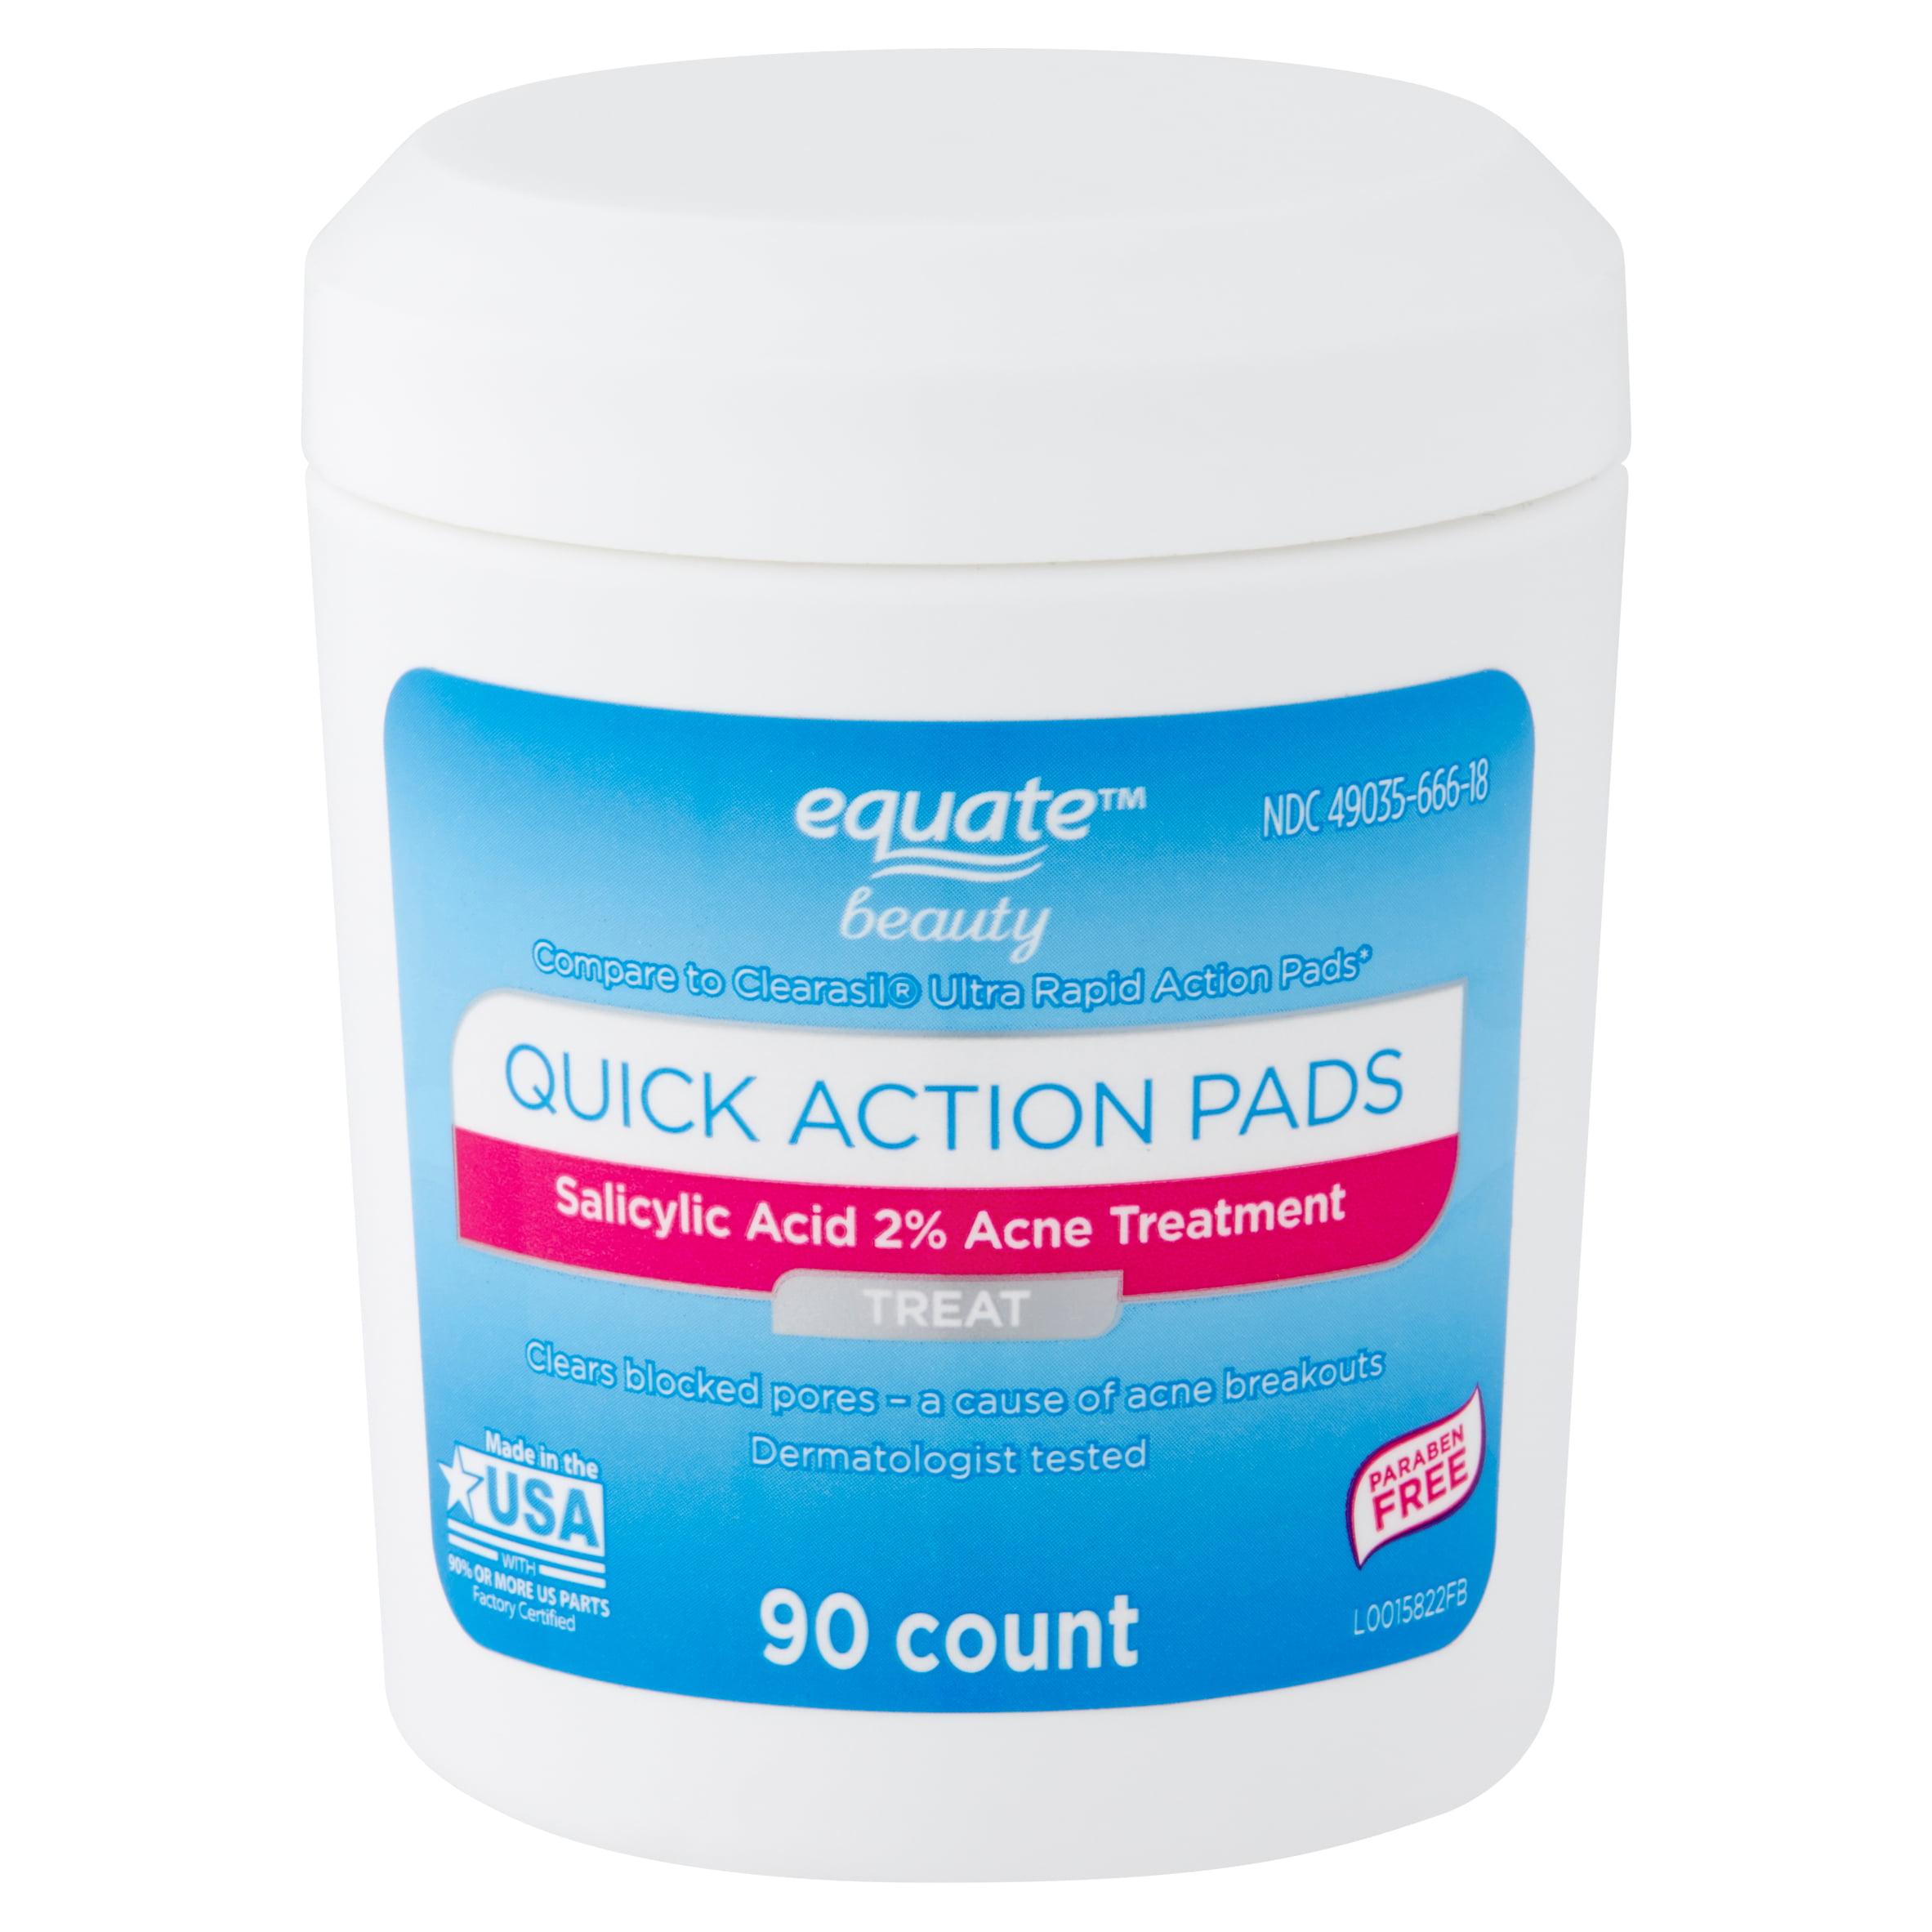 Equate Beauty Quick Action Pads 90 Count Walmart Com Walmart Com